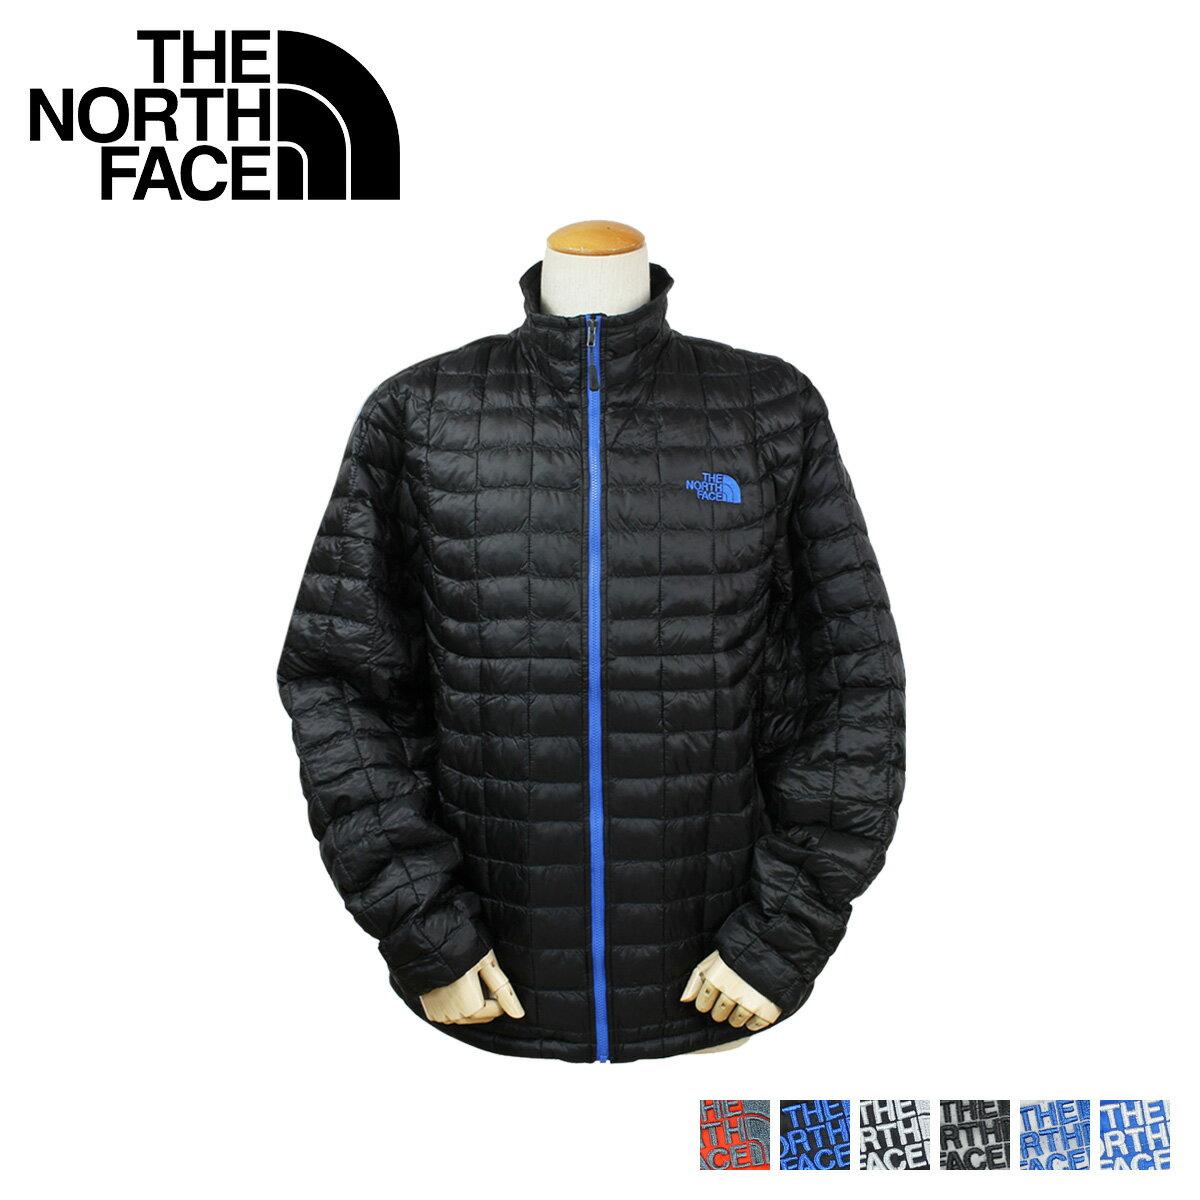 THE NORTH FACE ノースフェイス ジャケット MEN'S THERMOBALL FULL ZIP JACKET メンズ